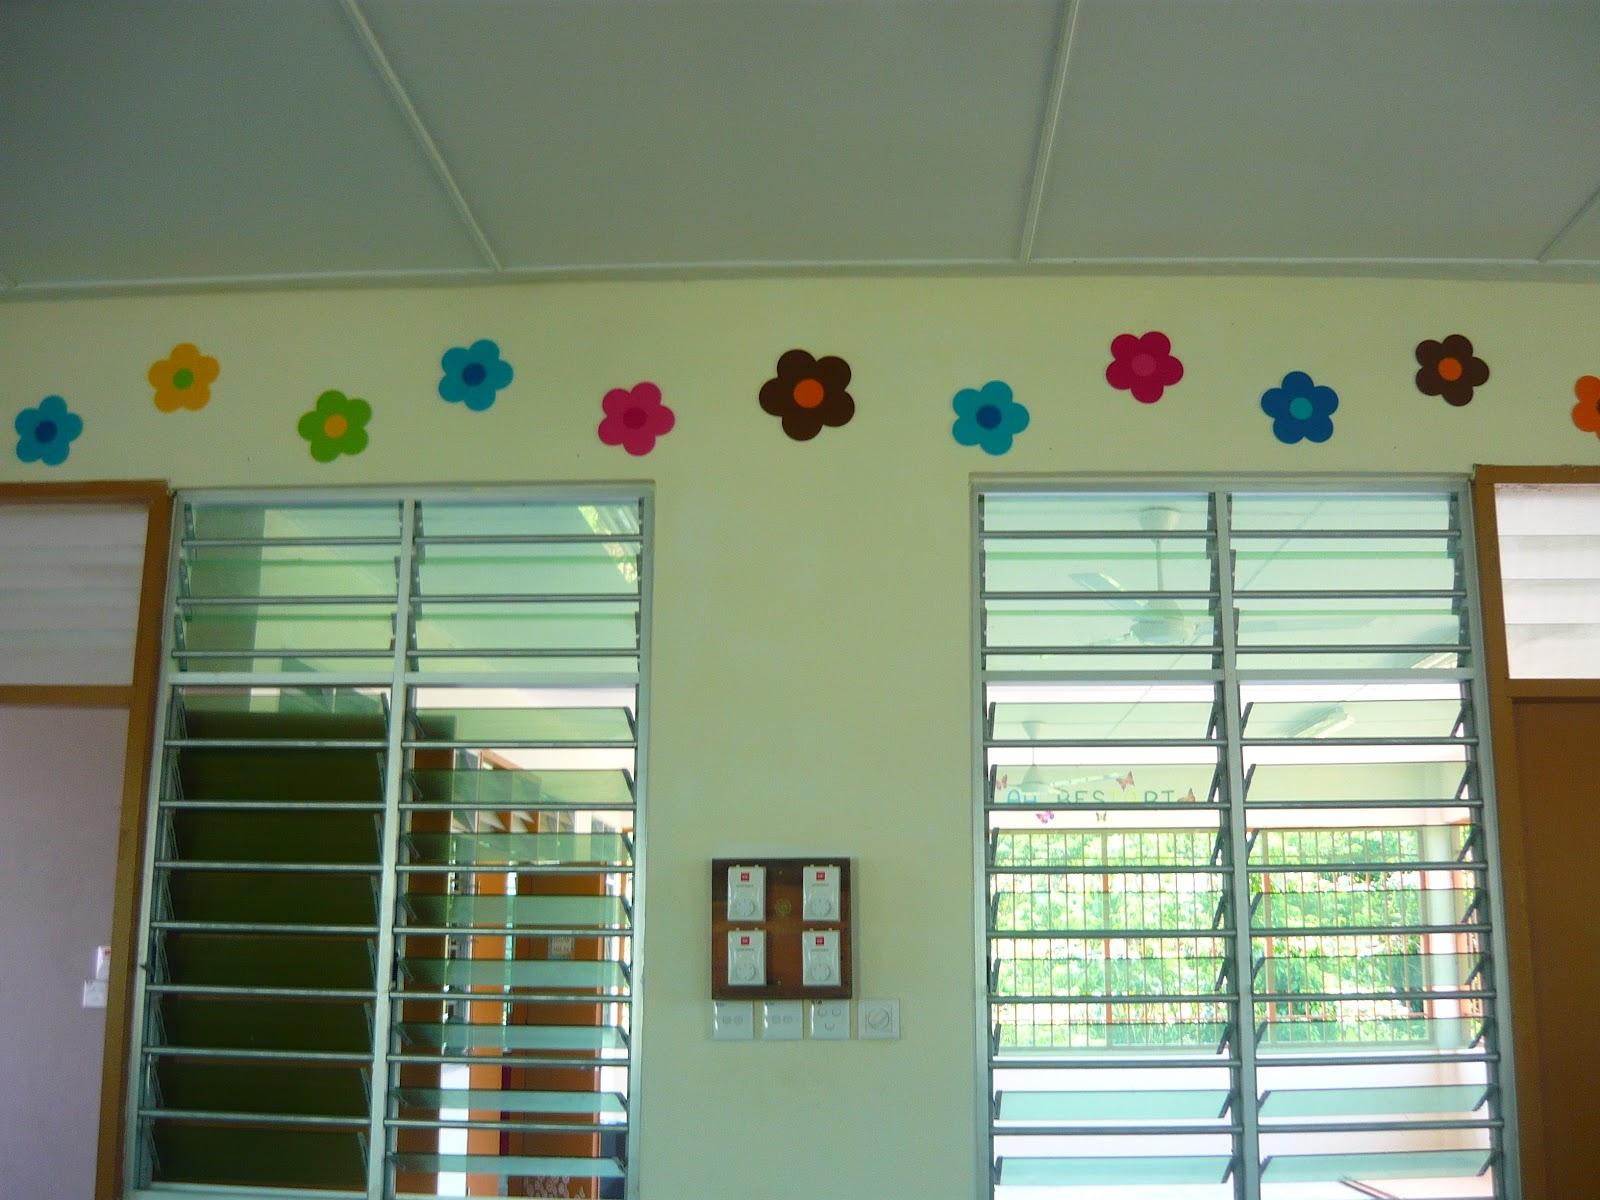 wallpaper windows 7 paling keren